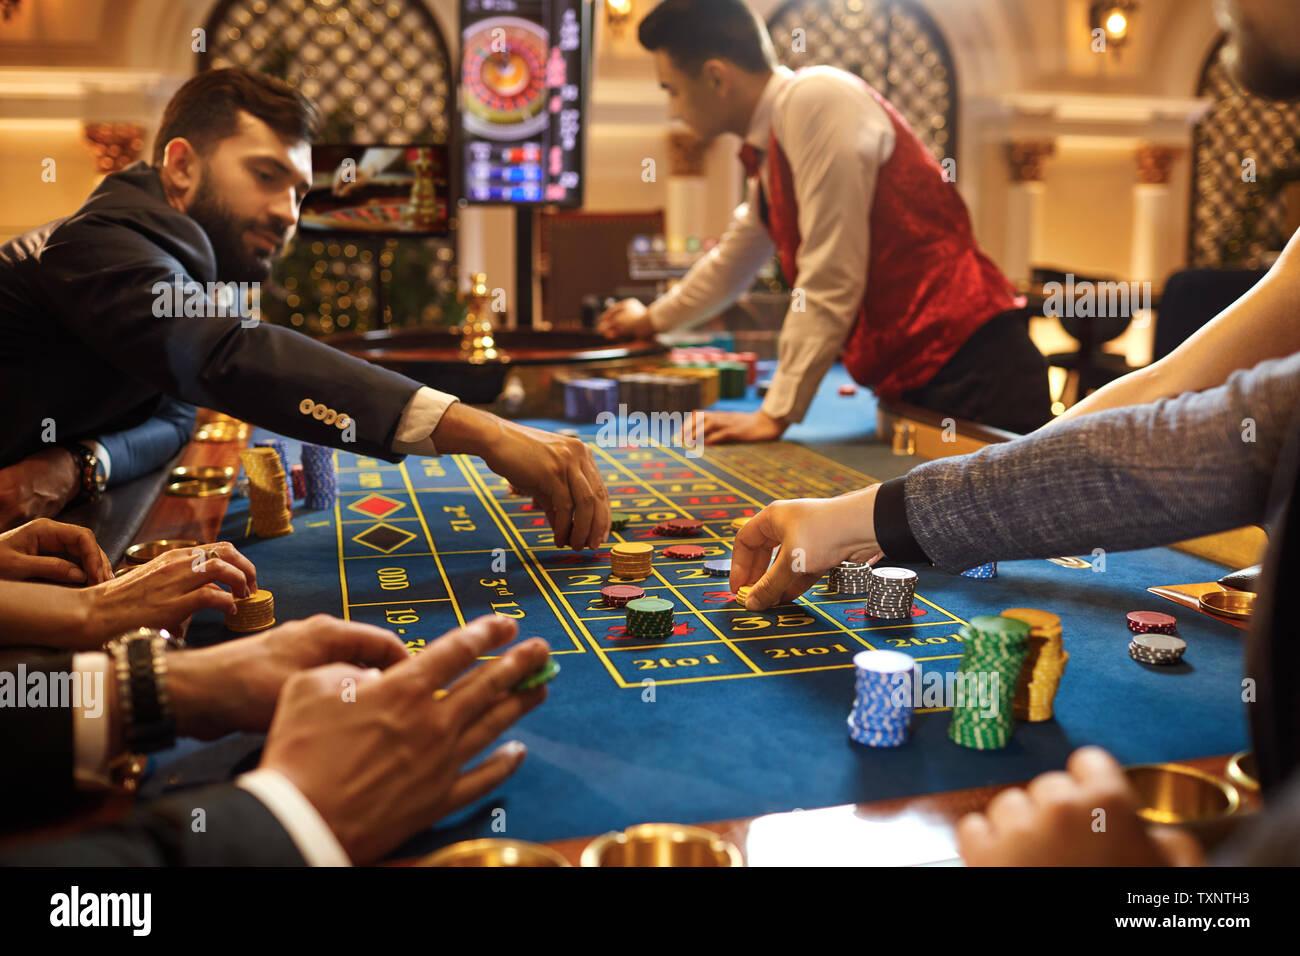 Casino casino gambling poker roulette steakhouse tucson casino